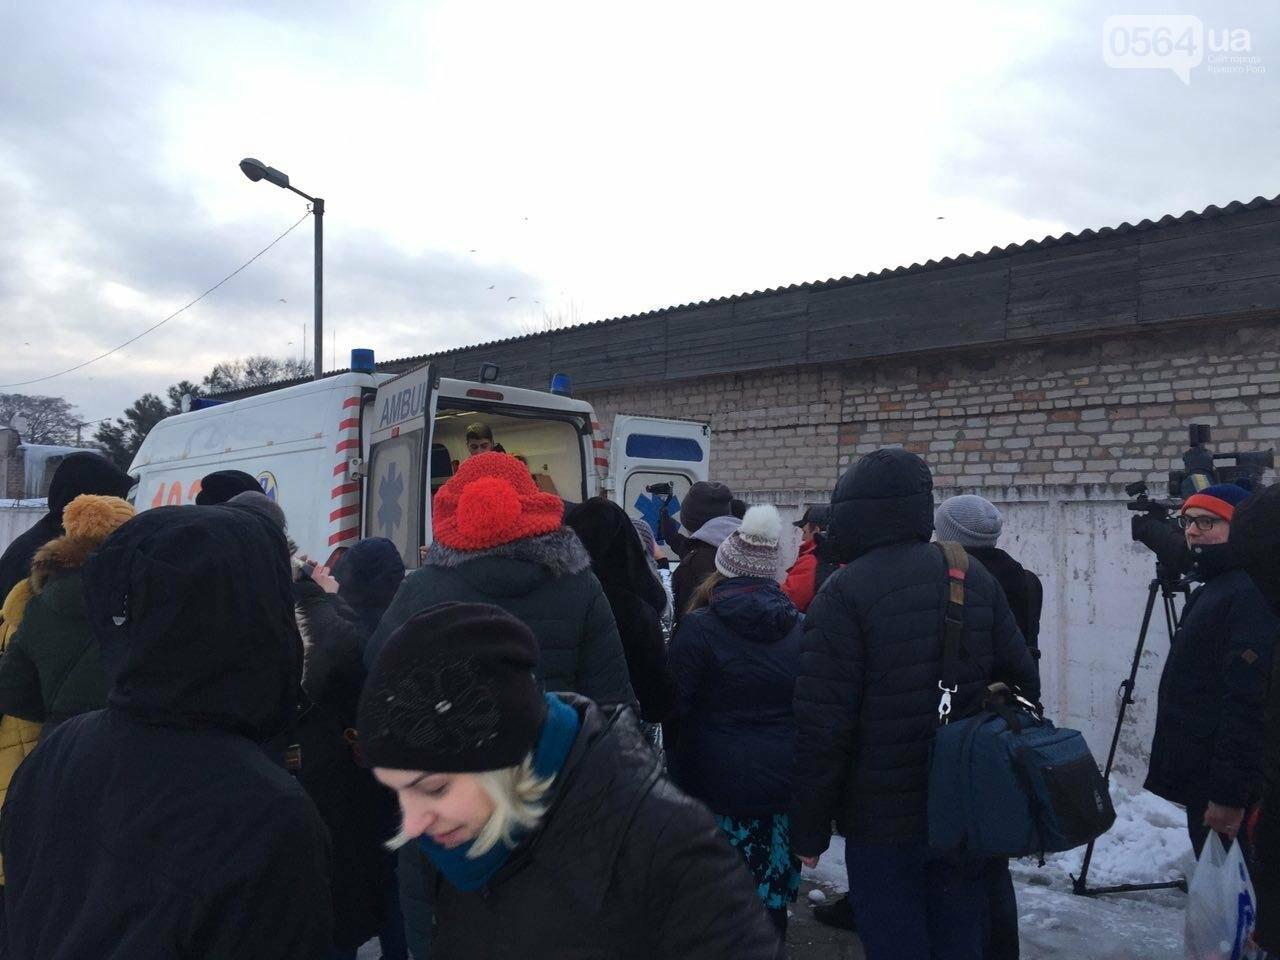 В Кривой Рог вернулся журналист Вячеслав Волк, тяжело раненый во время учений резервистов (ФОТО), фото-6